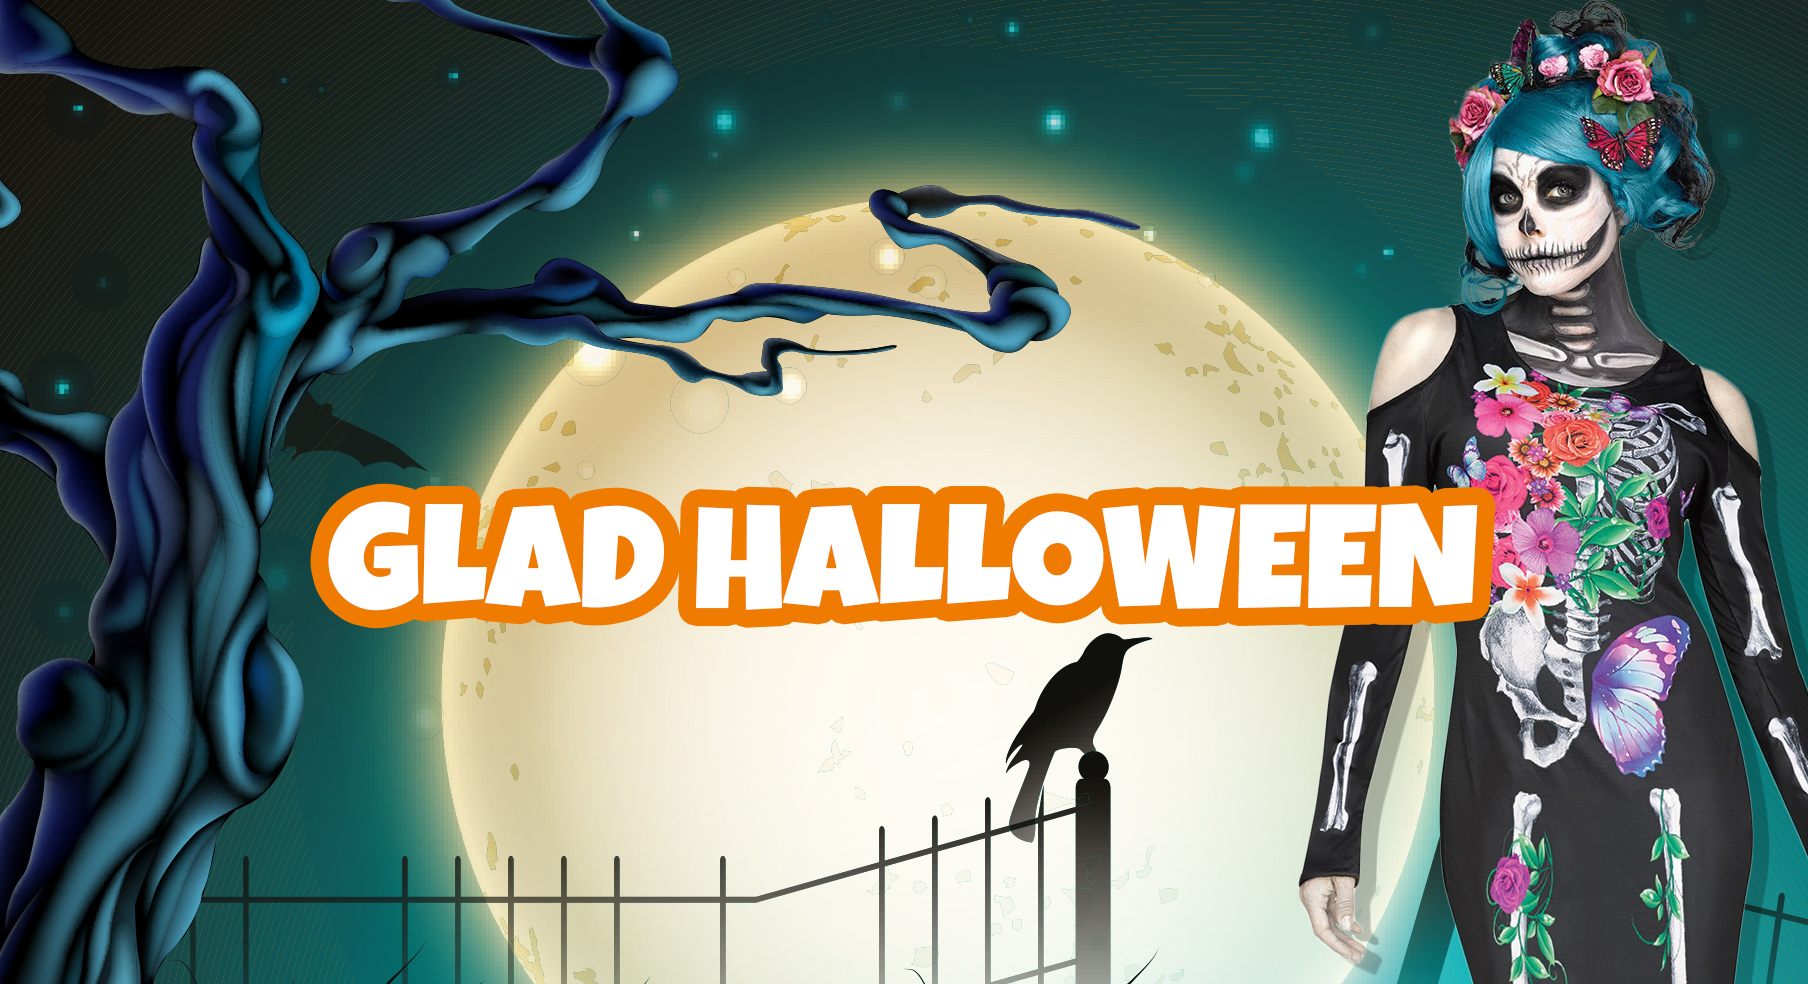 Glad Halloween!